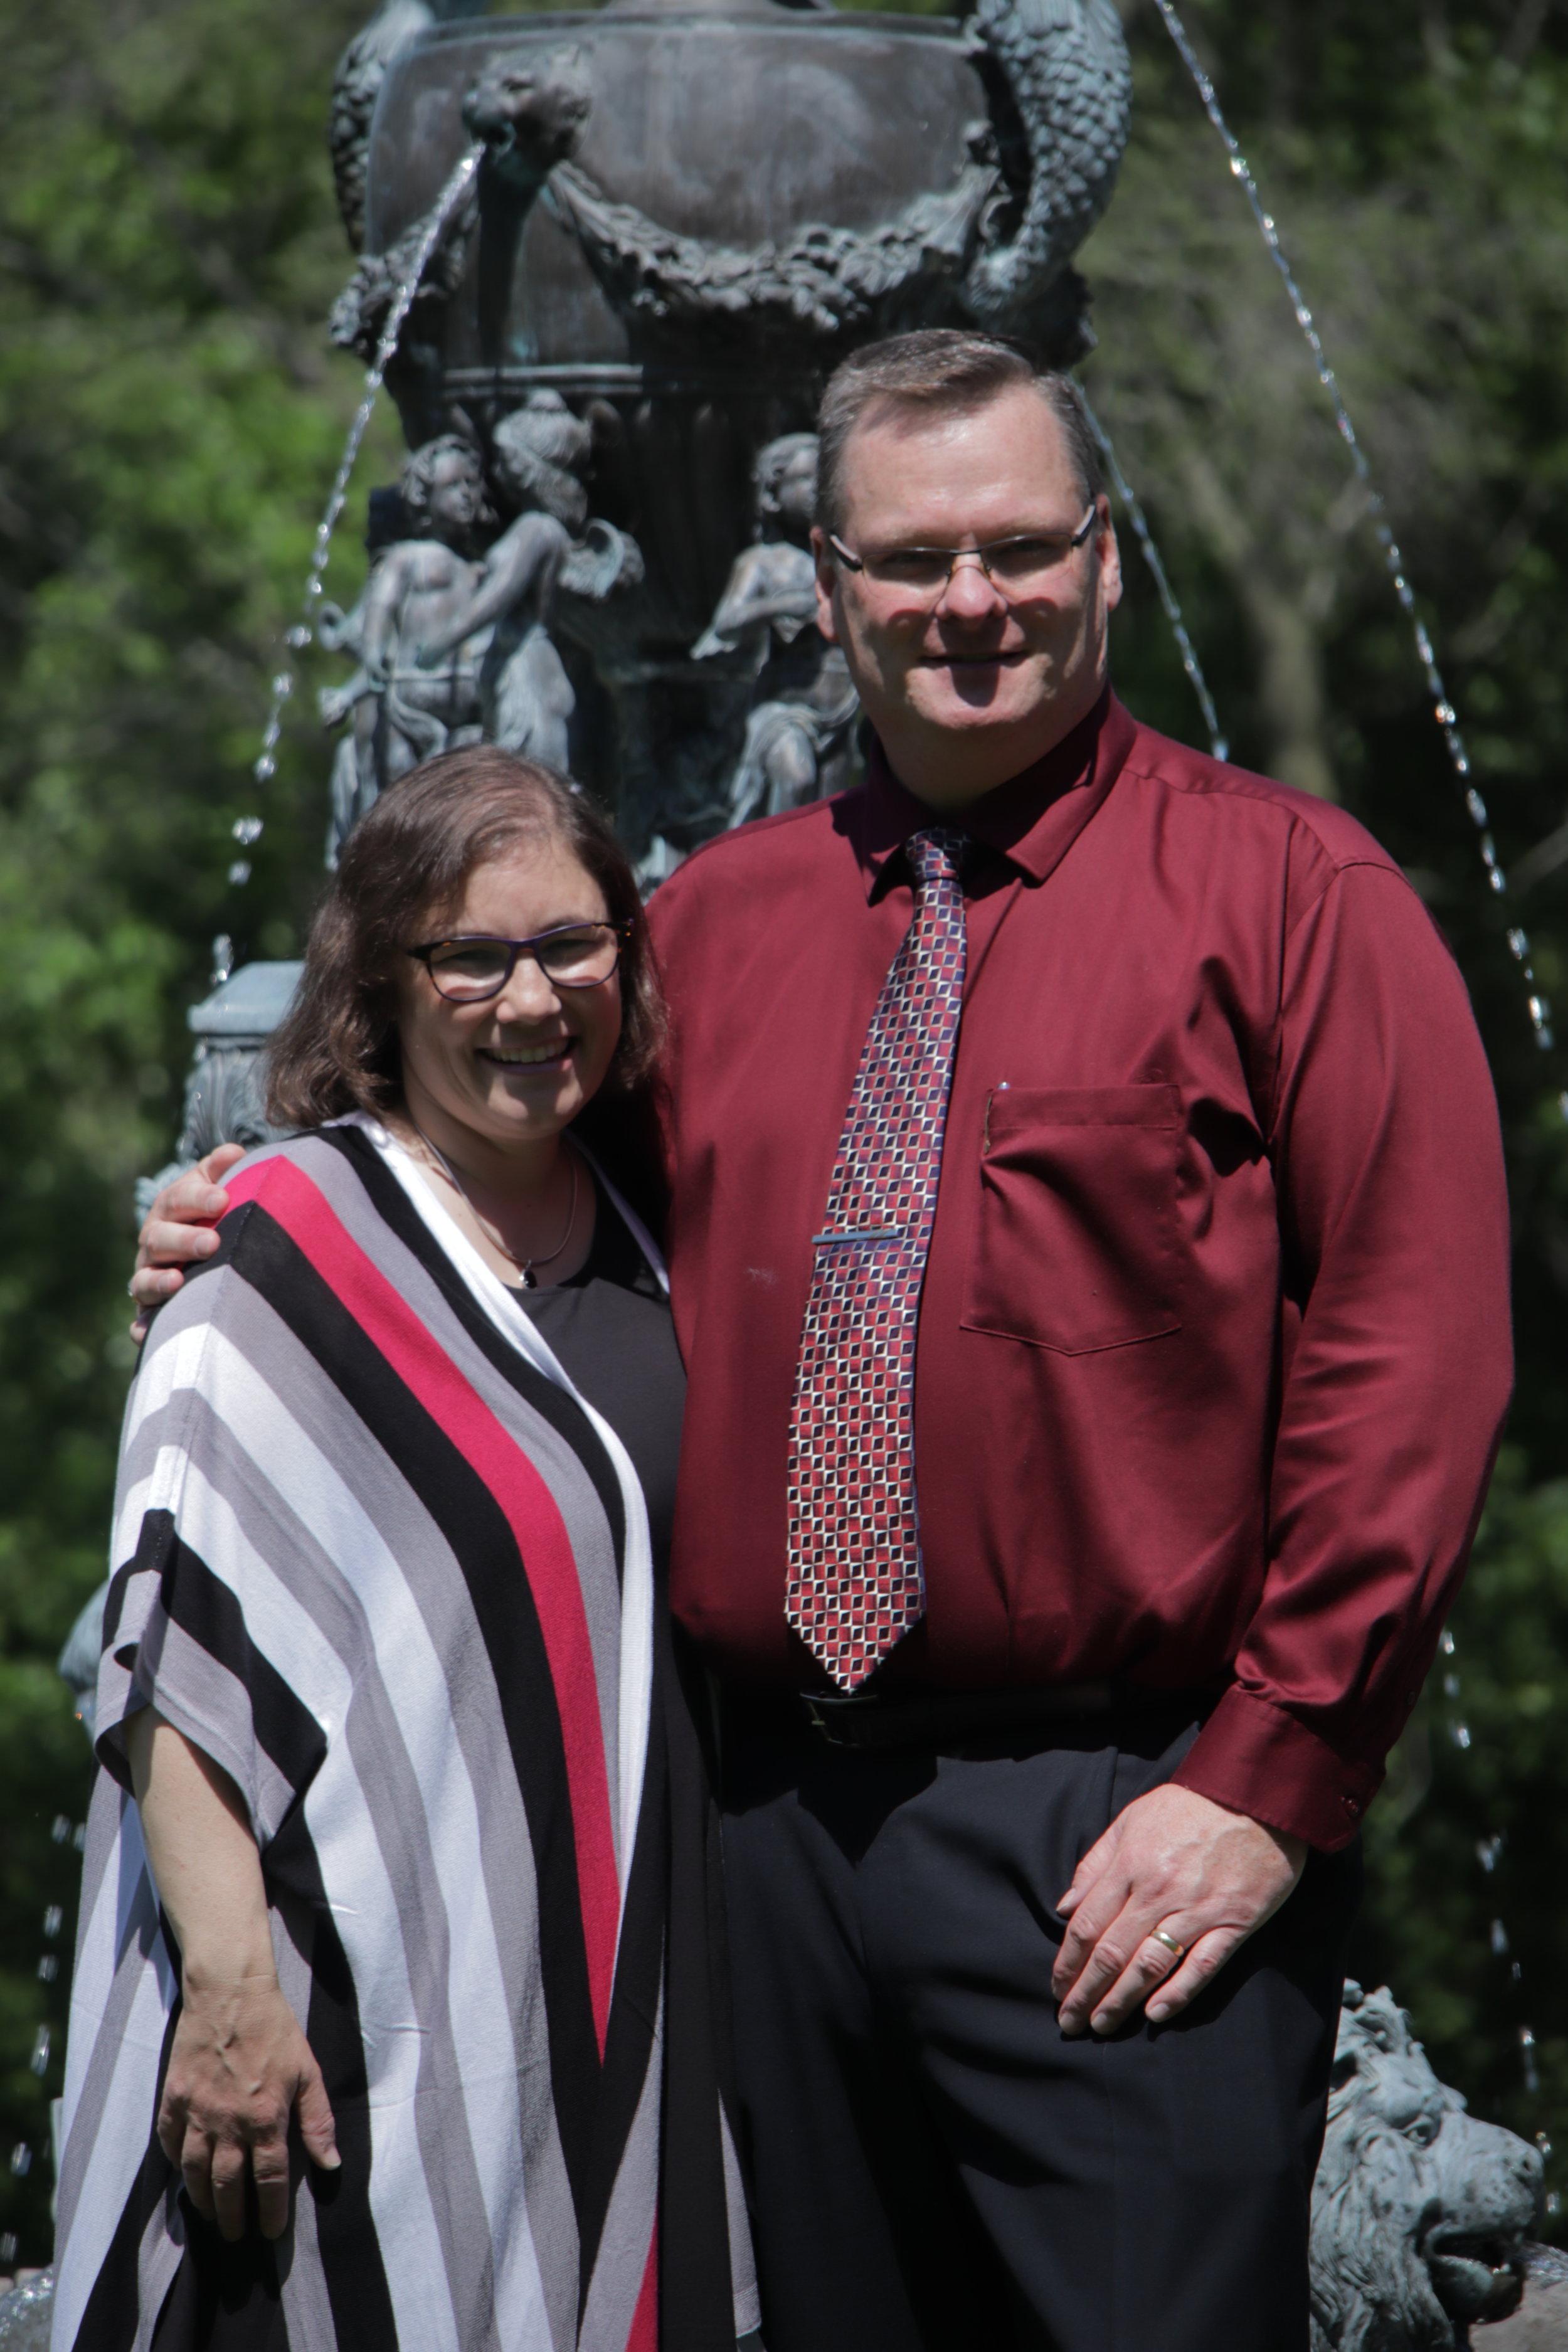 Brian and Sue Arnold - 25th Wedding Anniversary